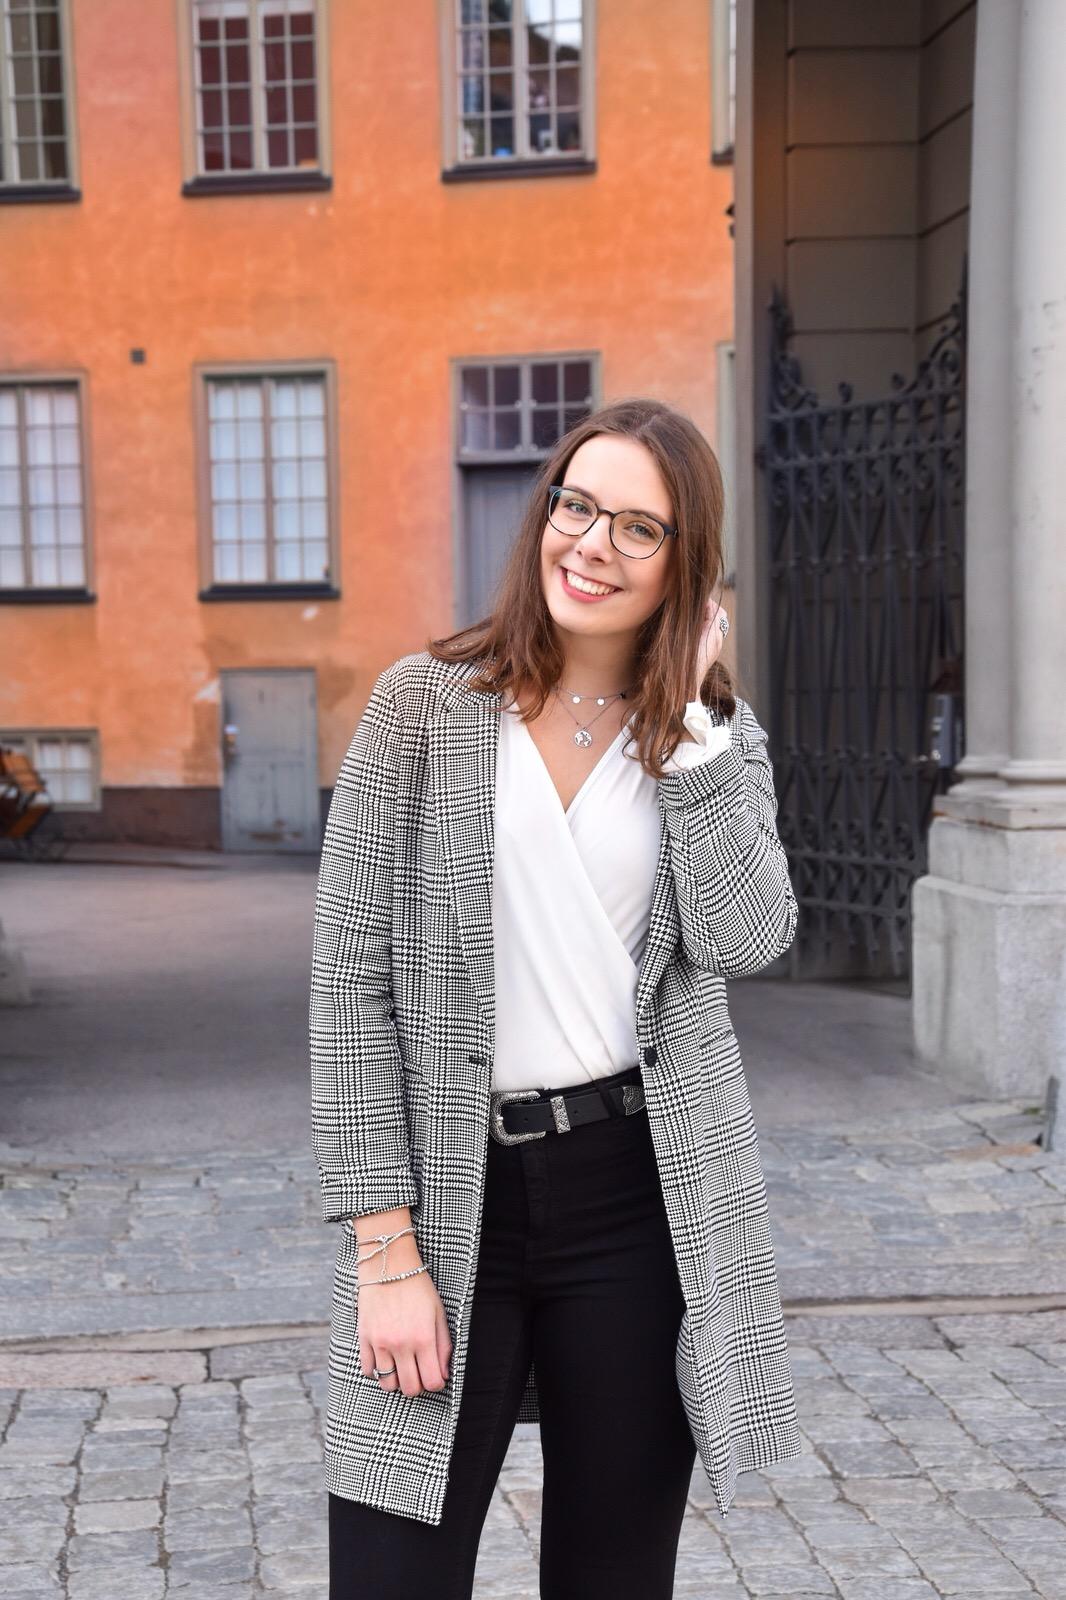 Johanna Hausberg